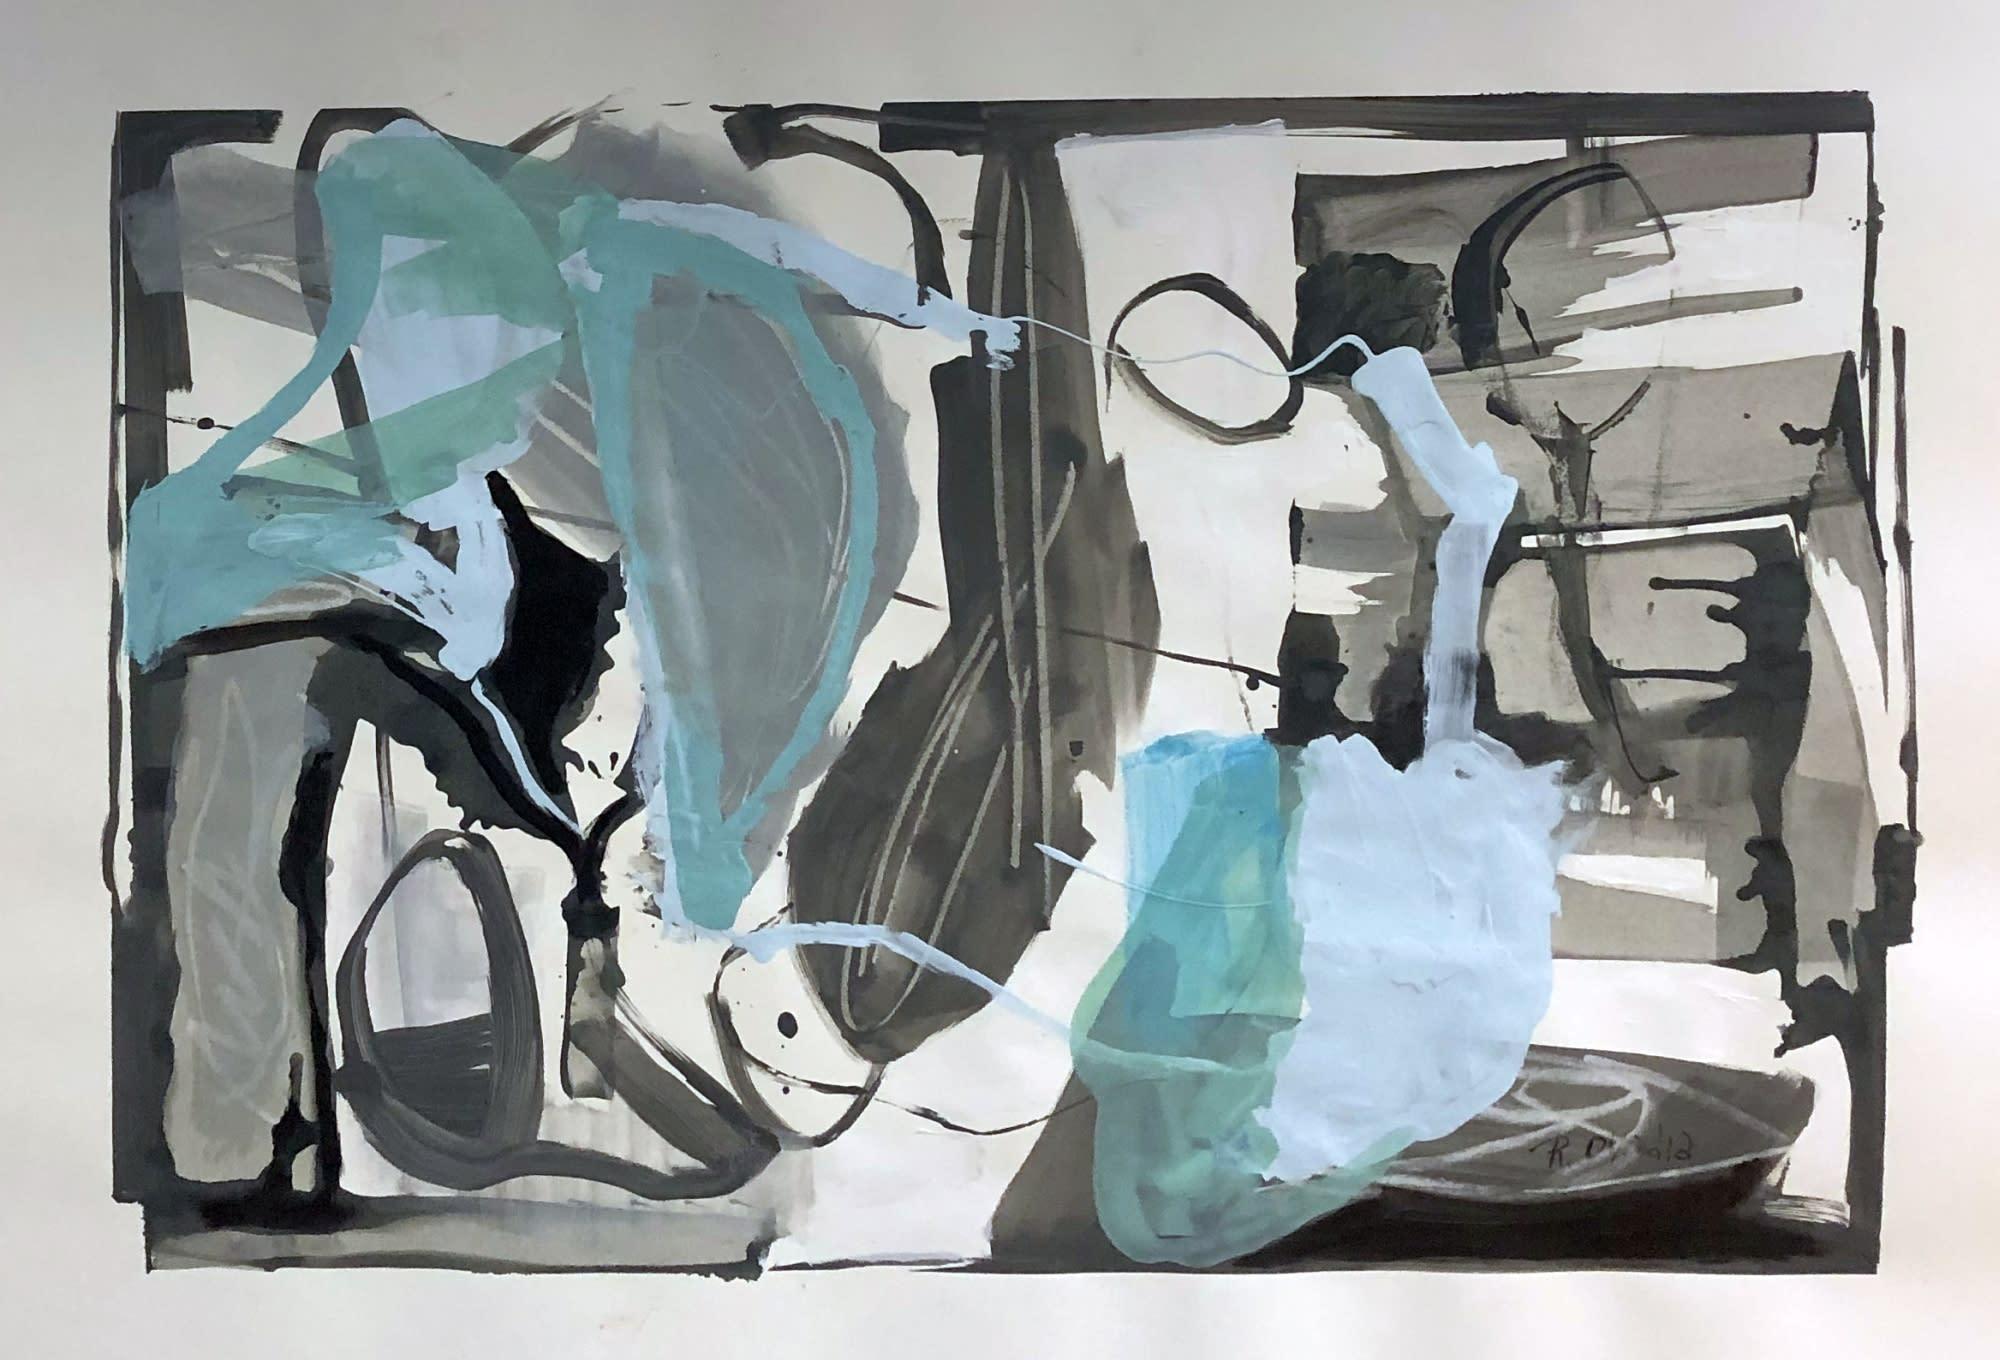 'Inhalation II' by Rachel Ovadia at Gallery 133